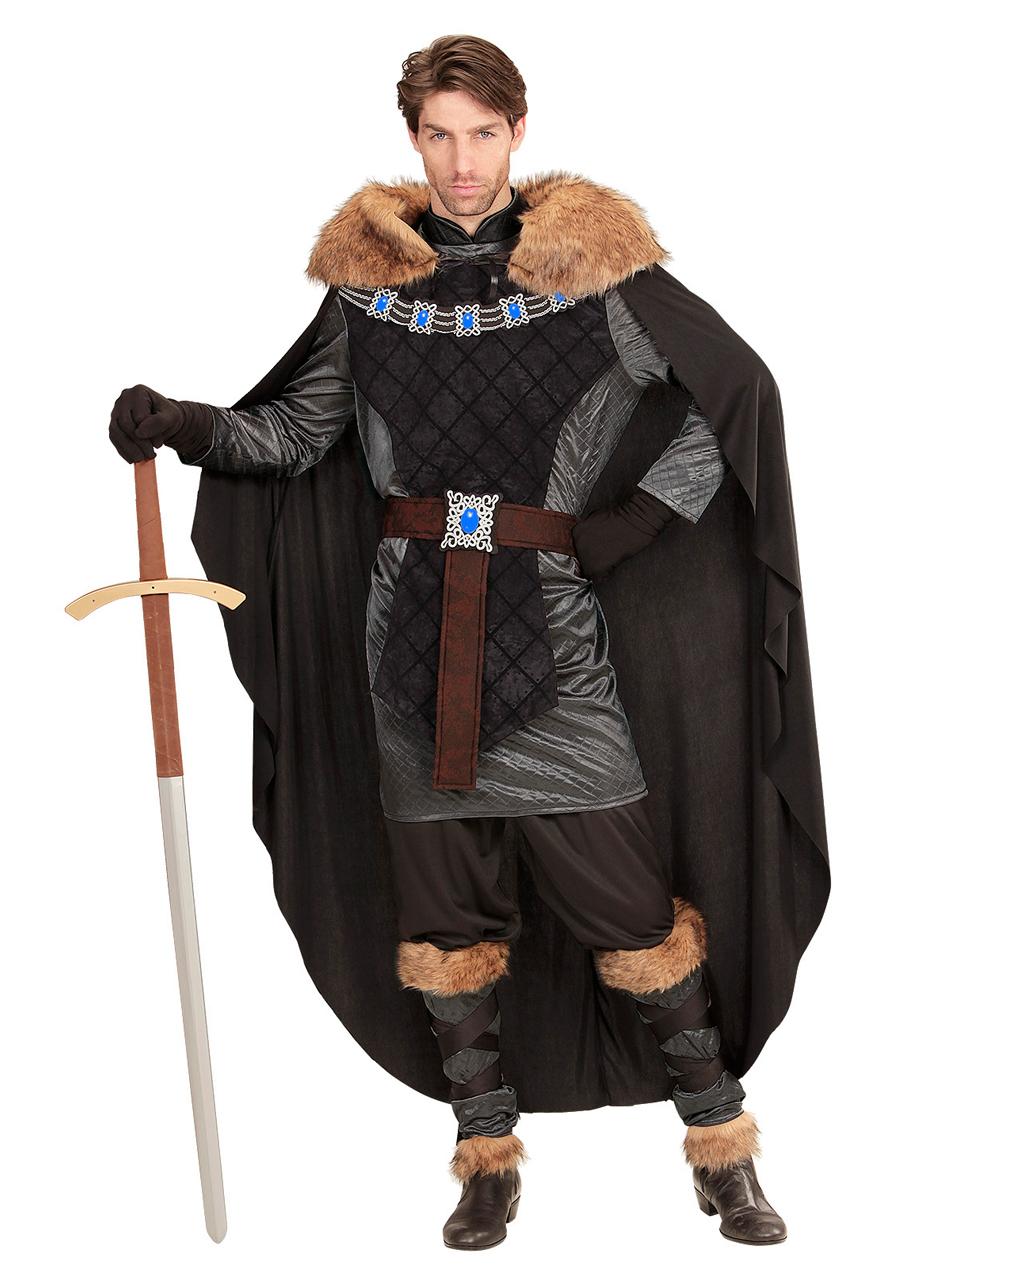 Karneval Klamotten Kostüm Helm Ritter Zubehör Mittelalter Karneval